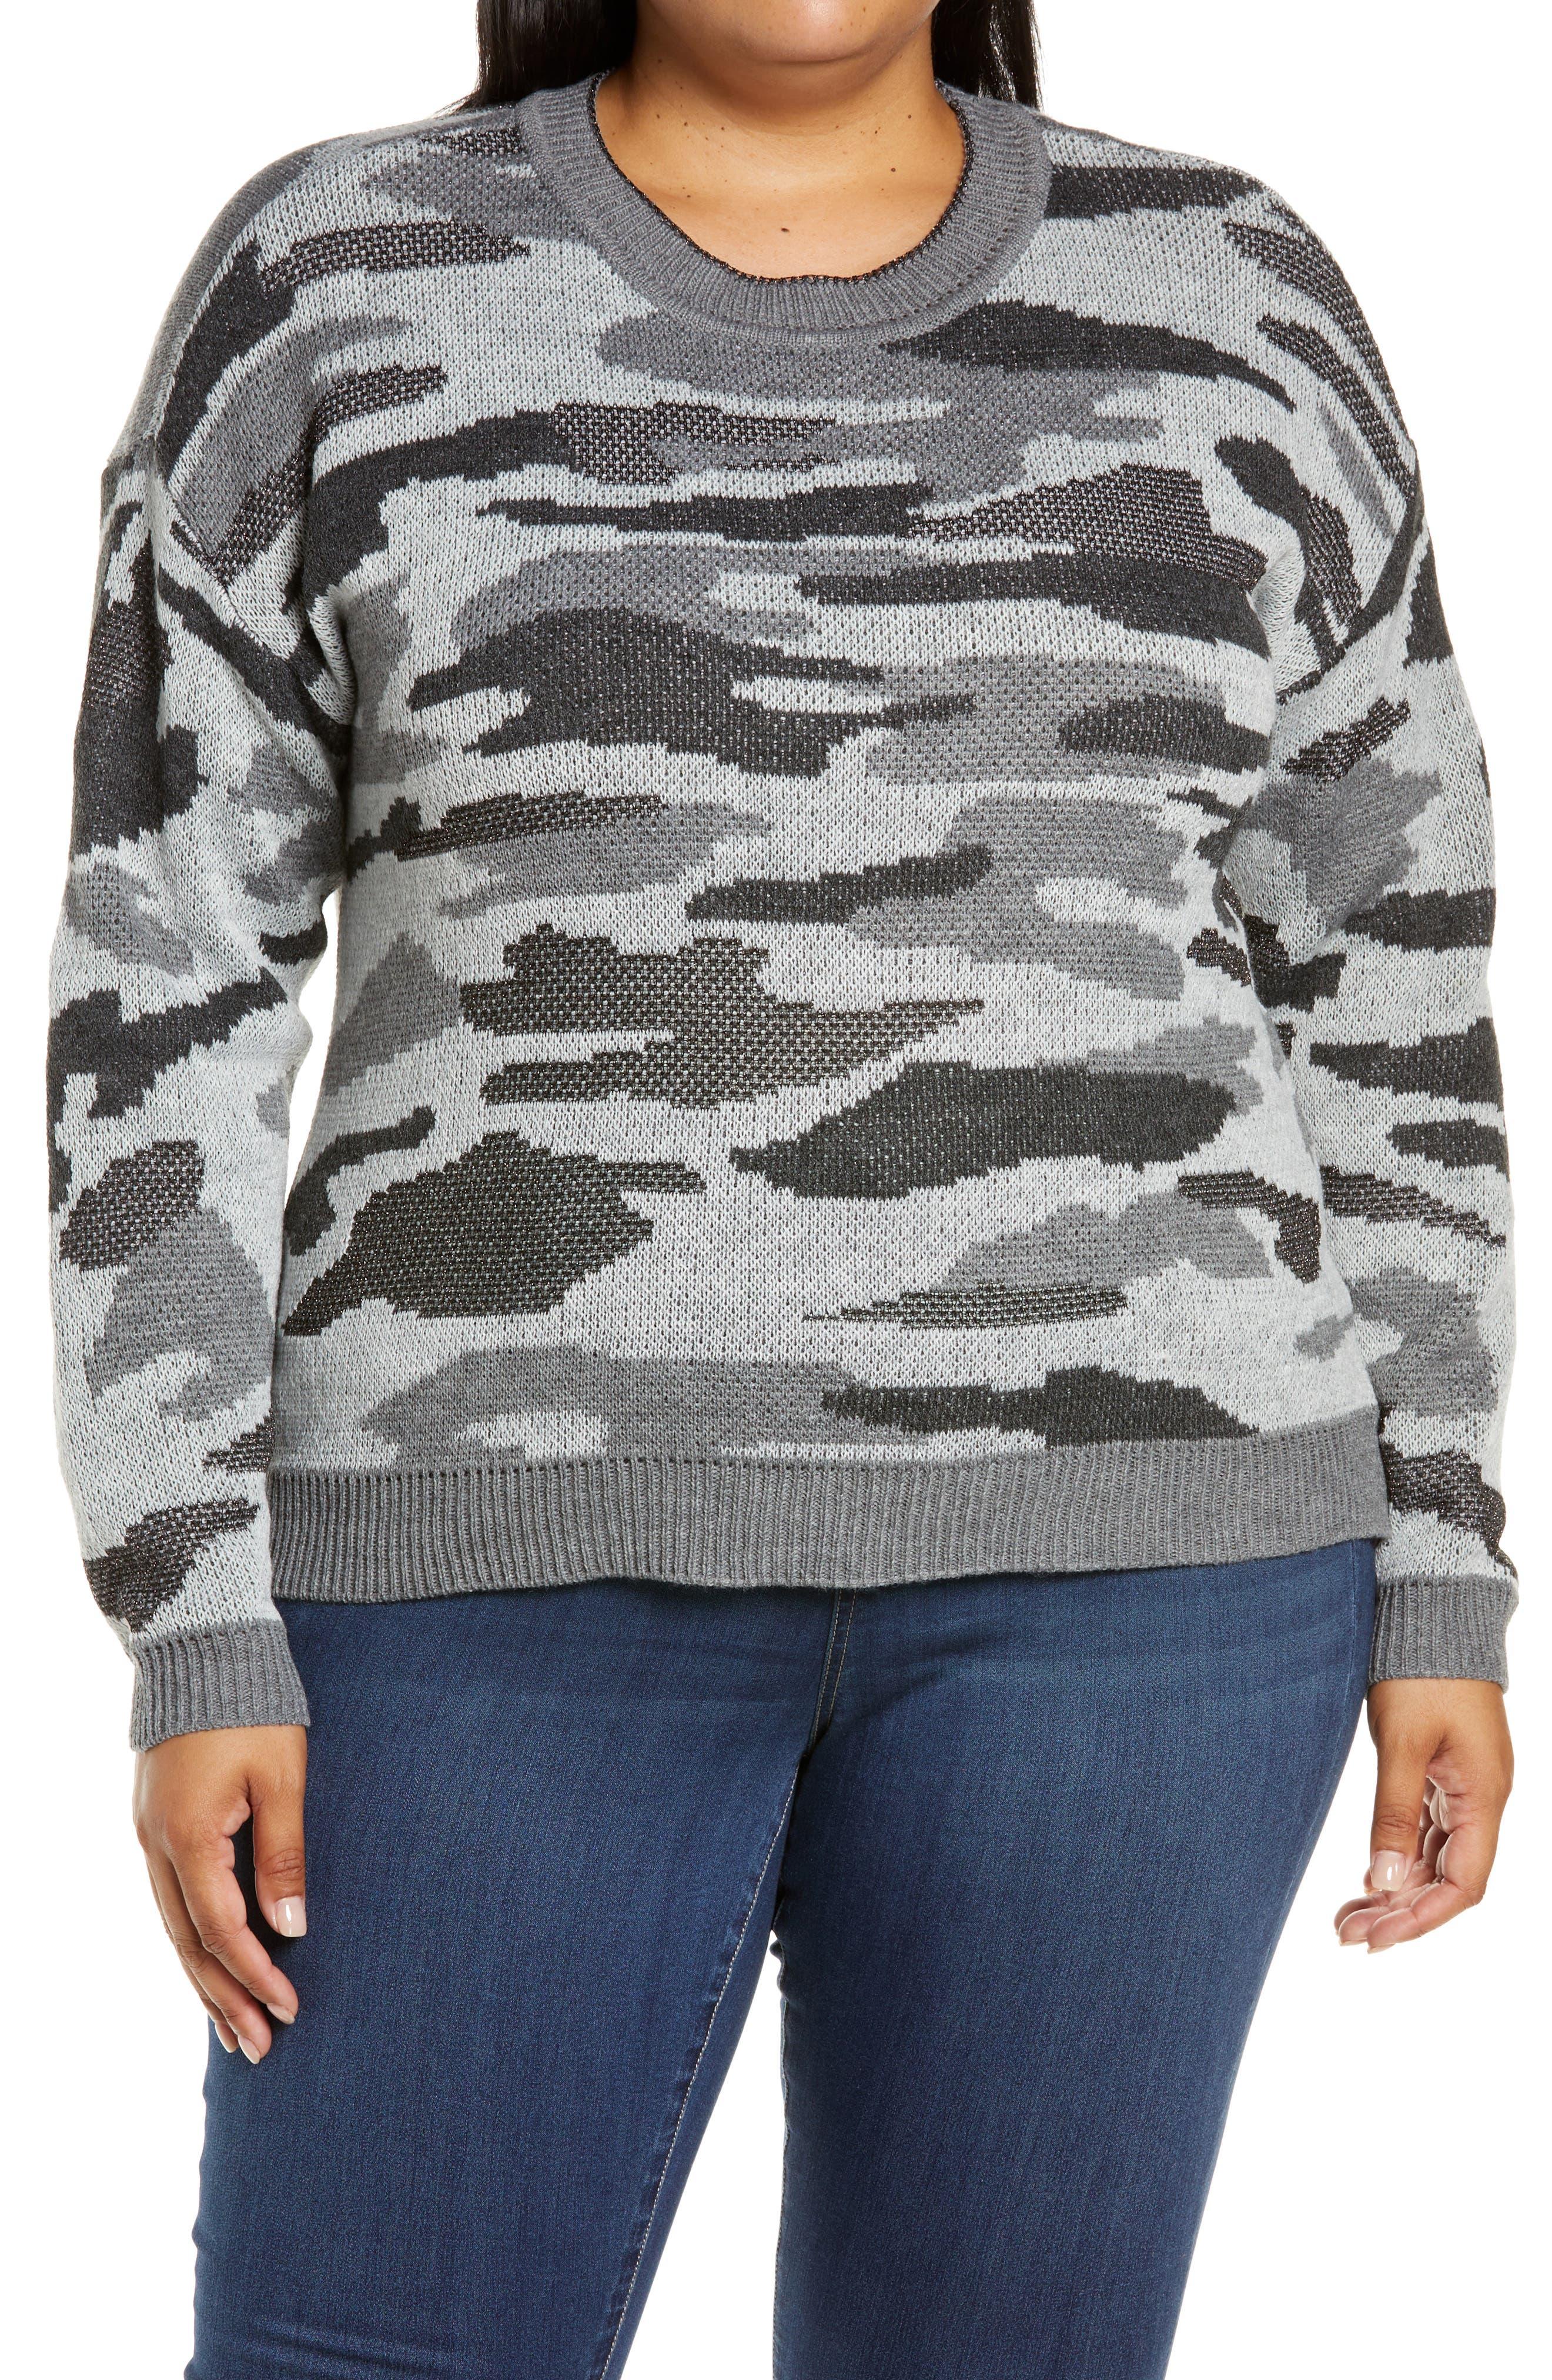 Camo Crewneck Sweater